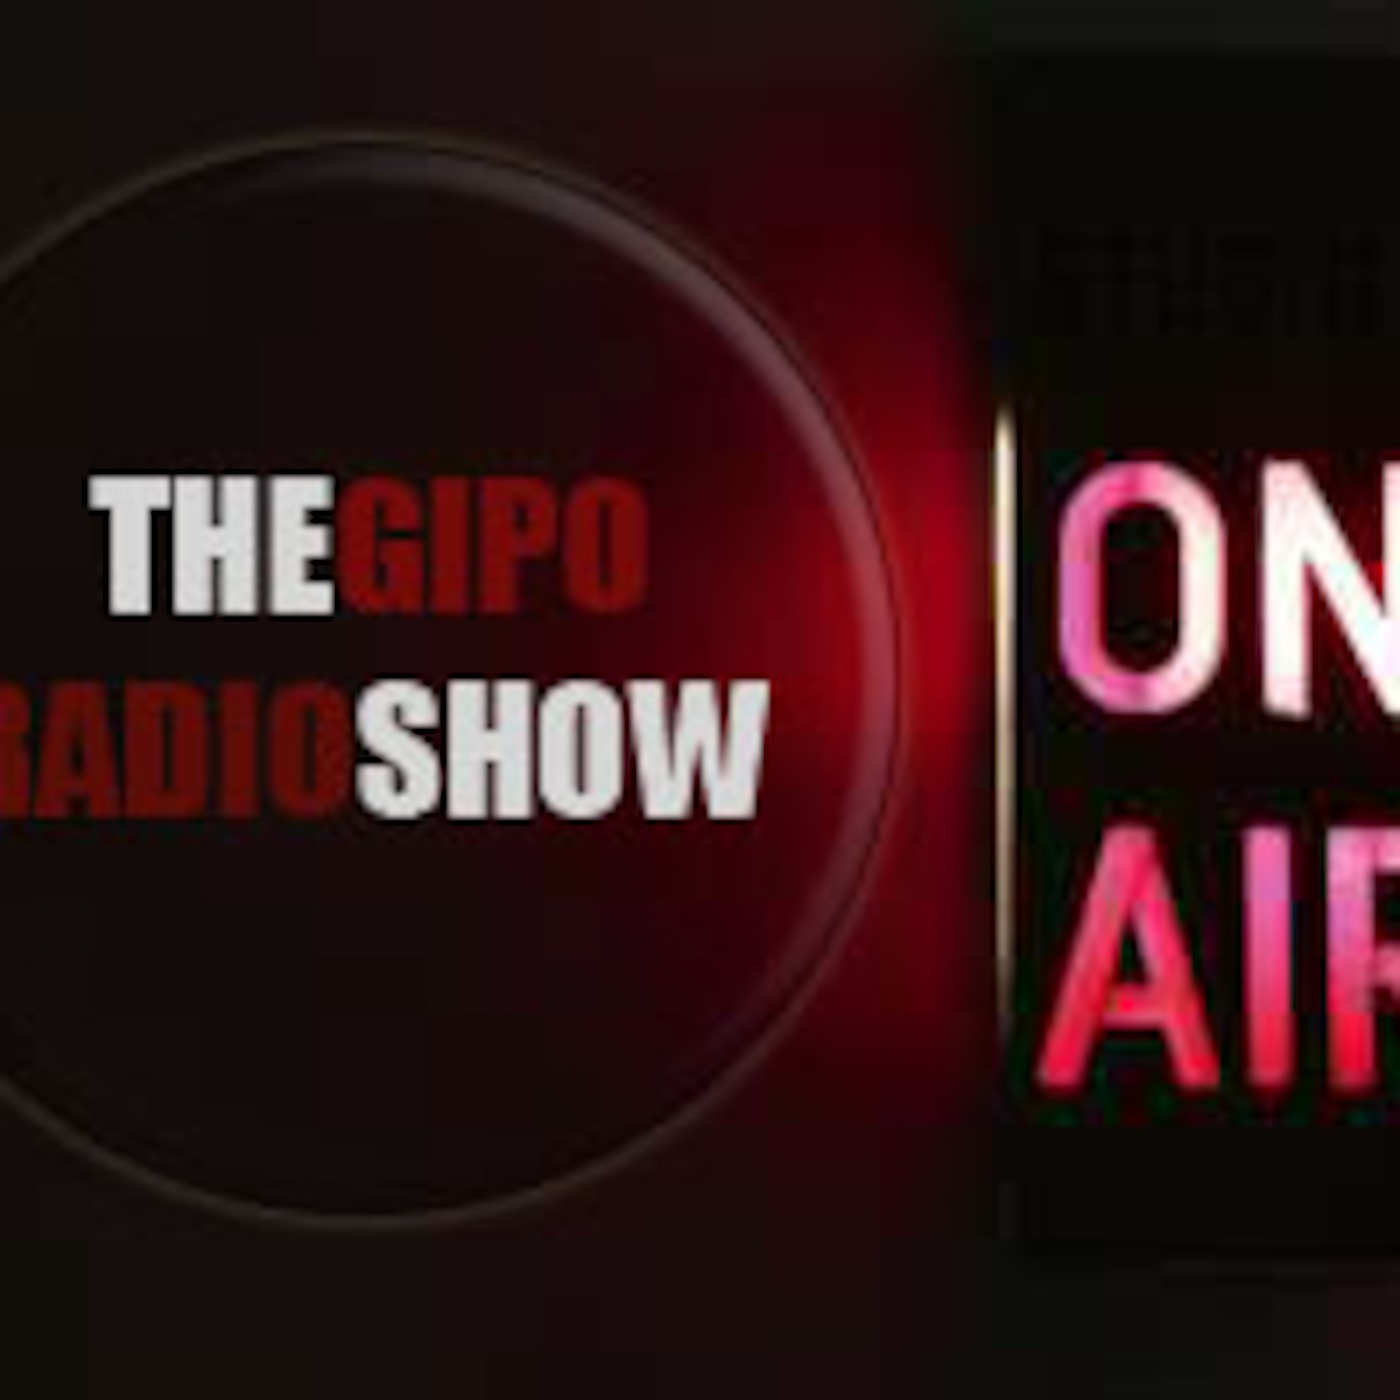 Thegipo Official Radioshow